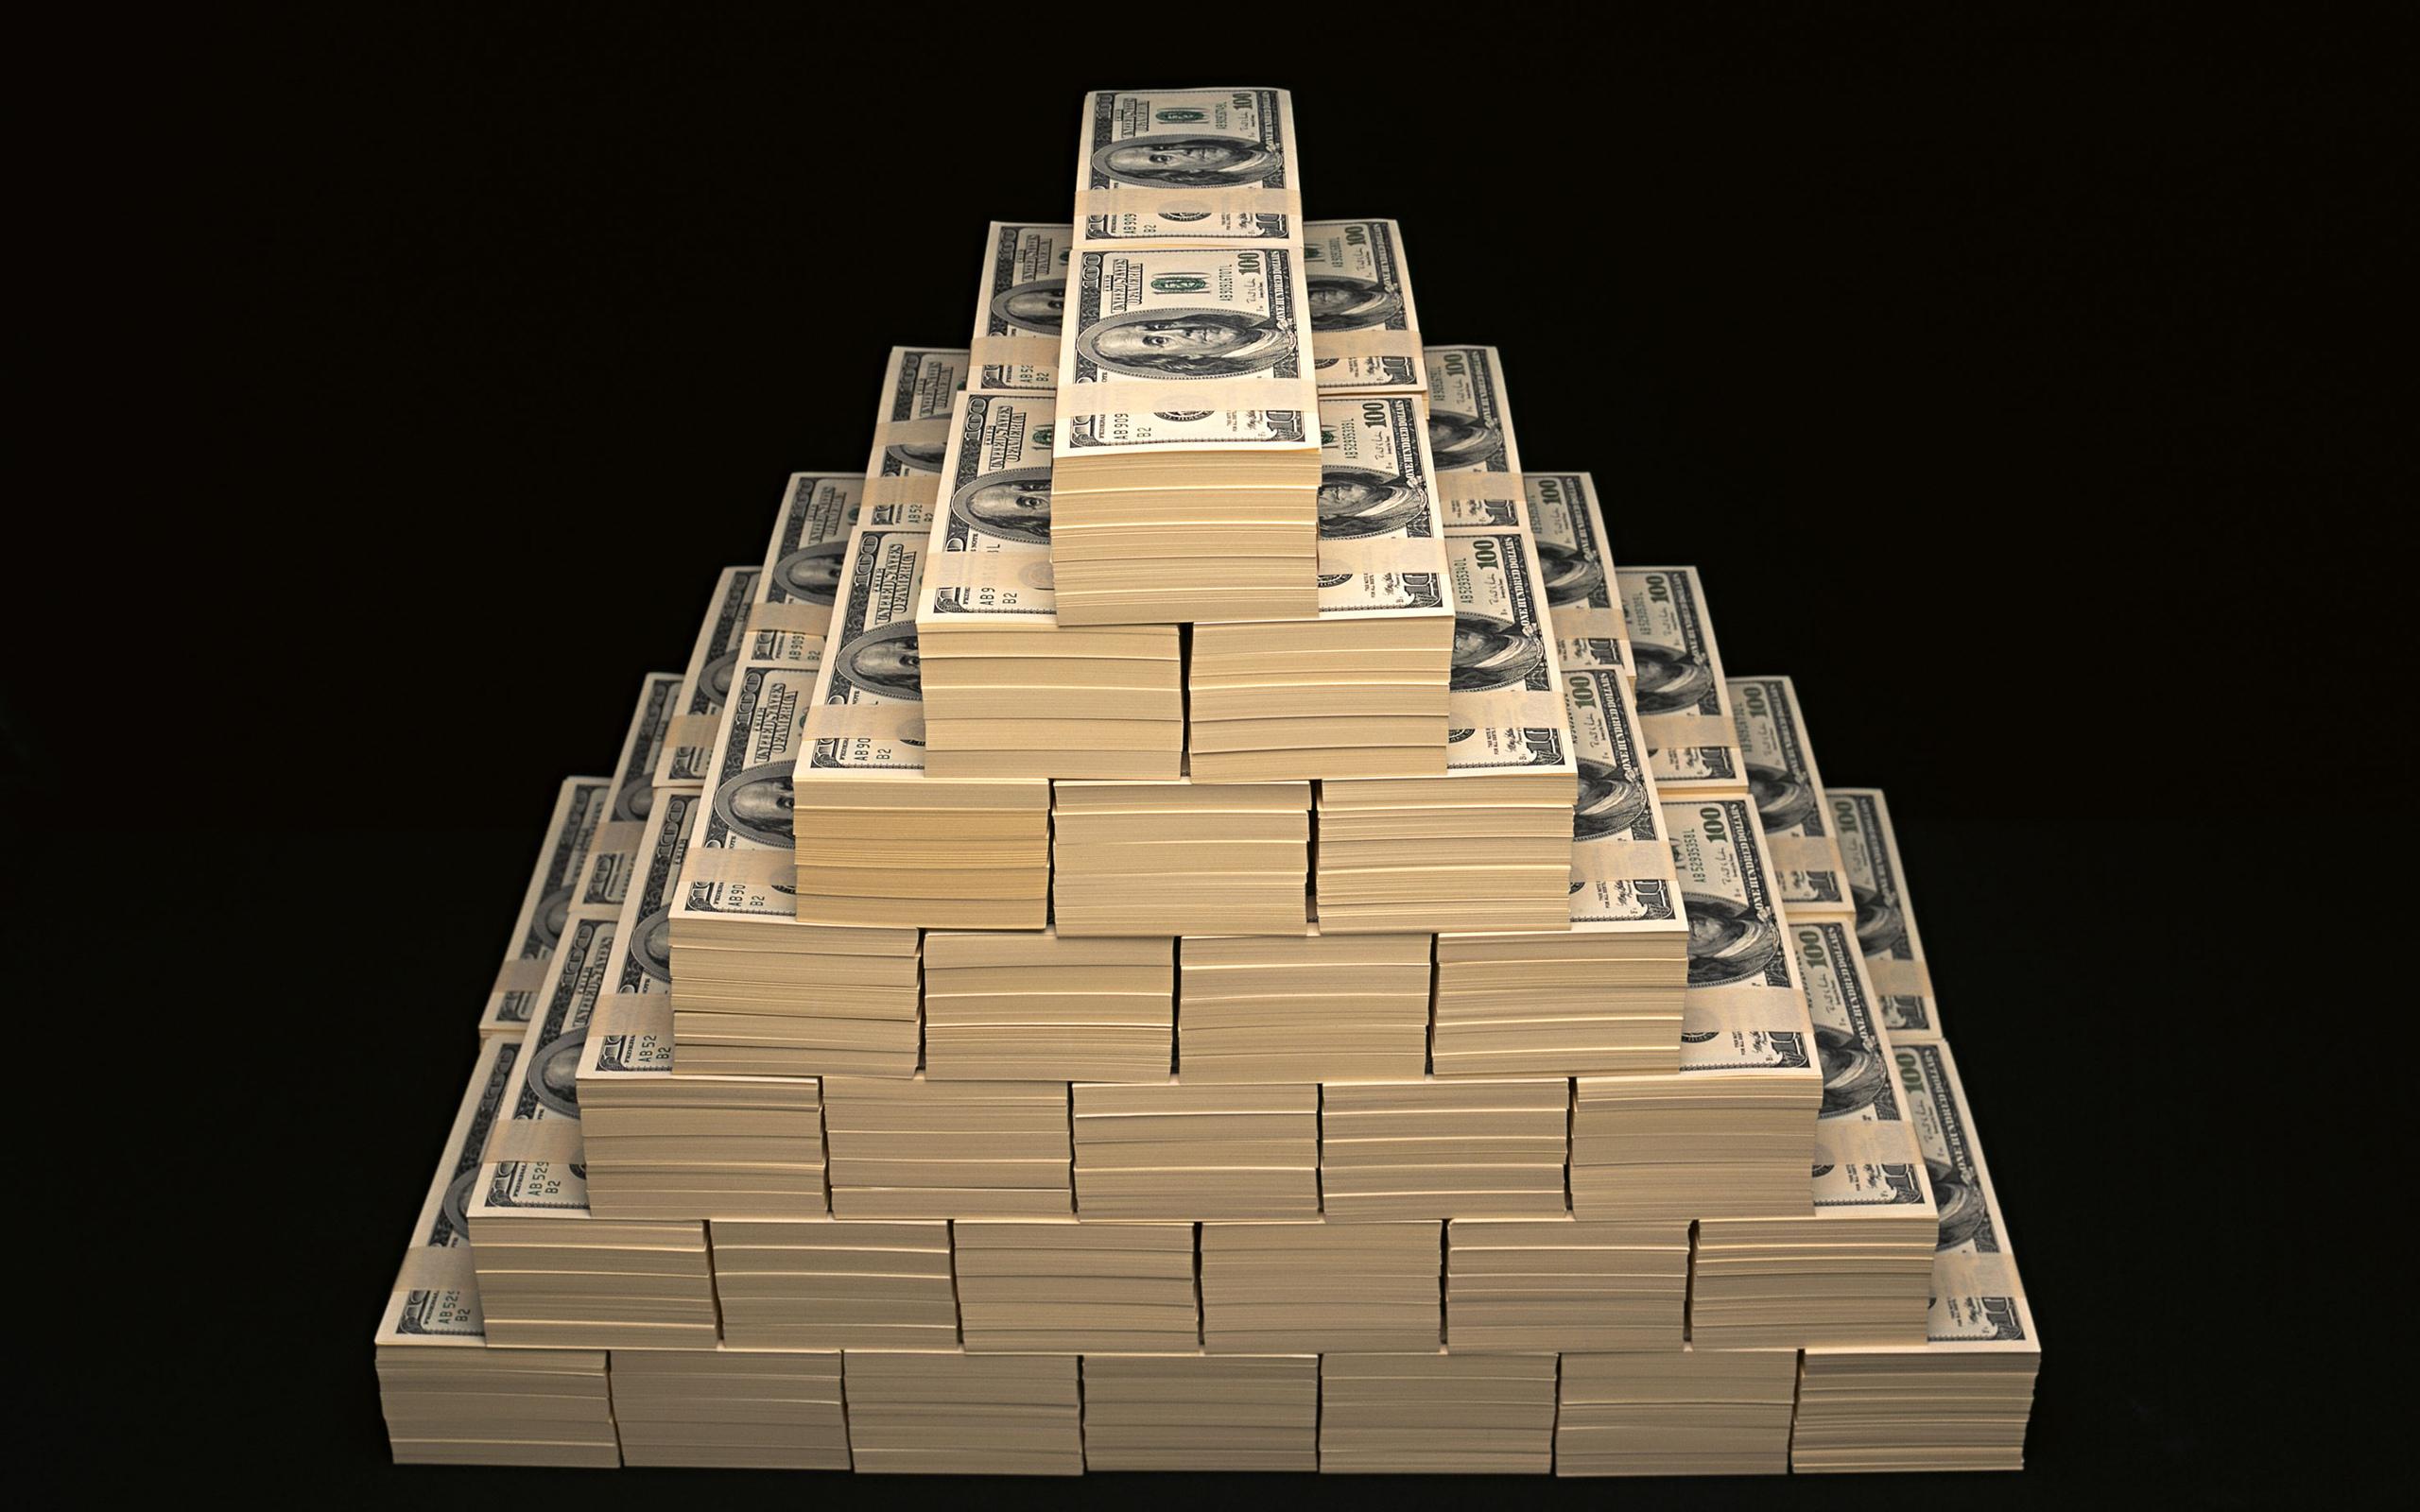 General 2560x1600 dollars money Wealth dark background high angle